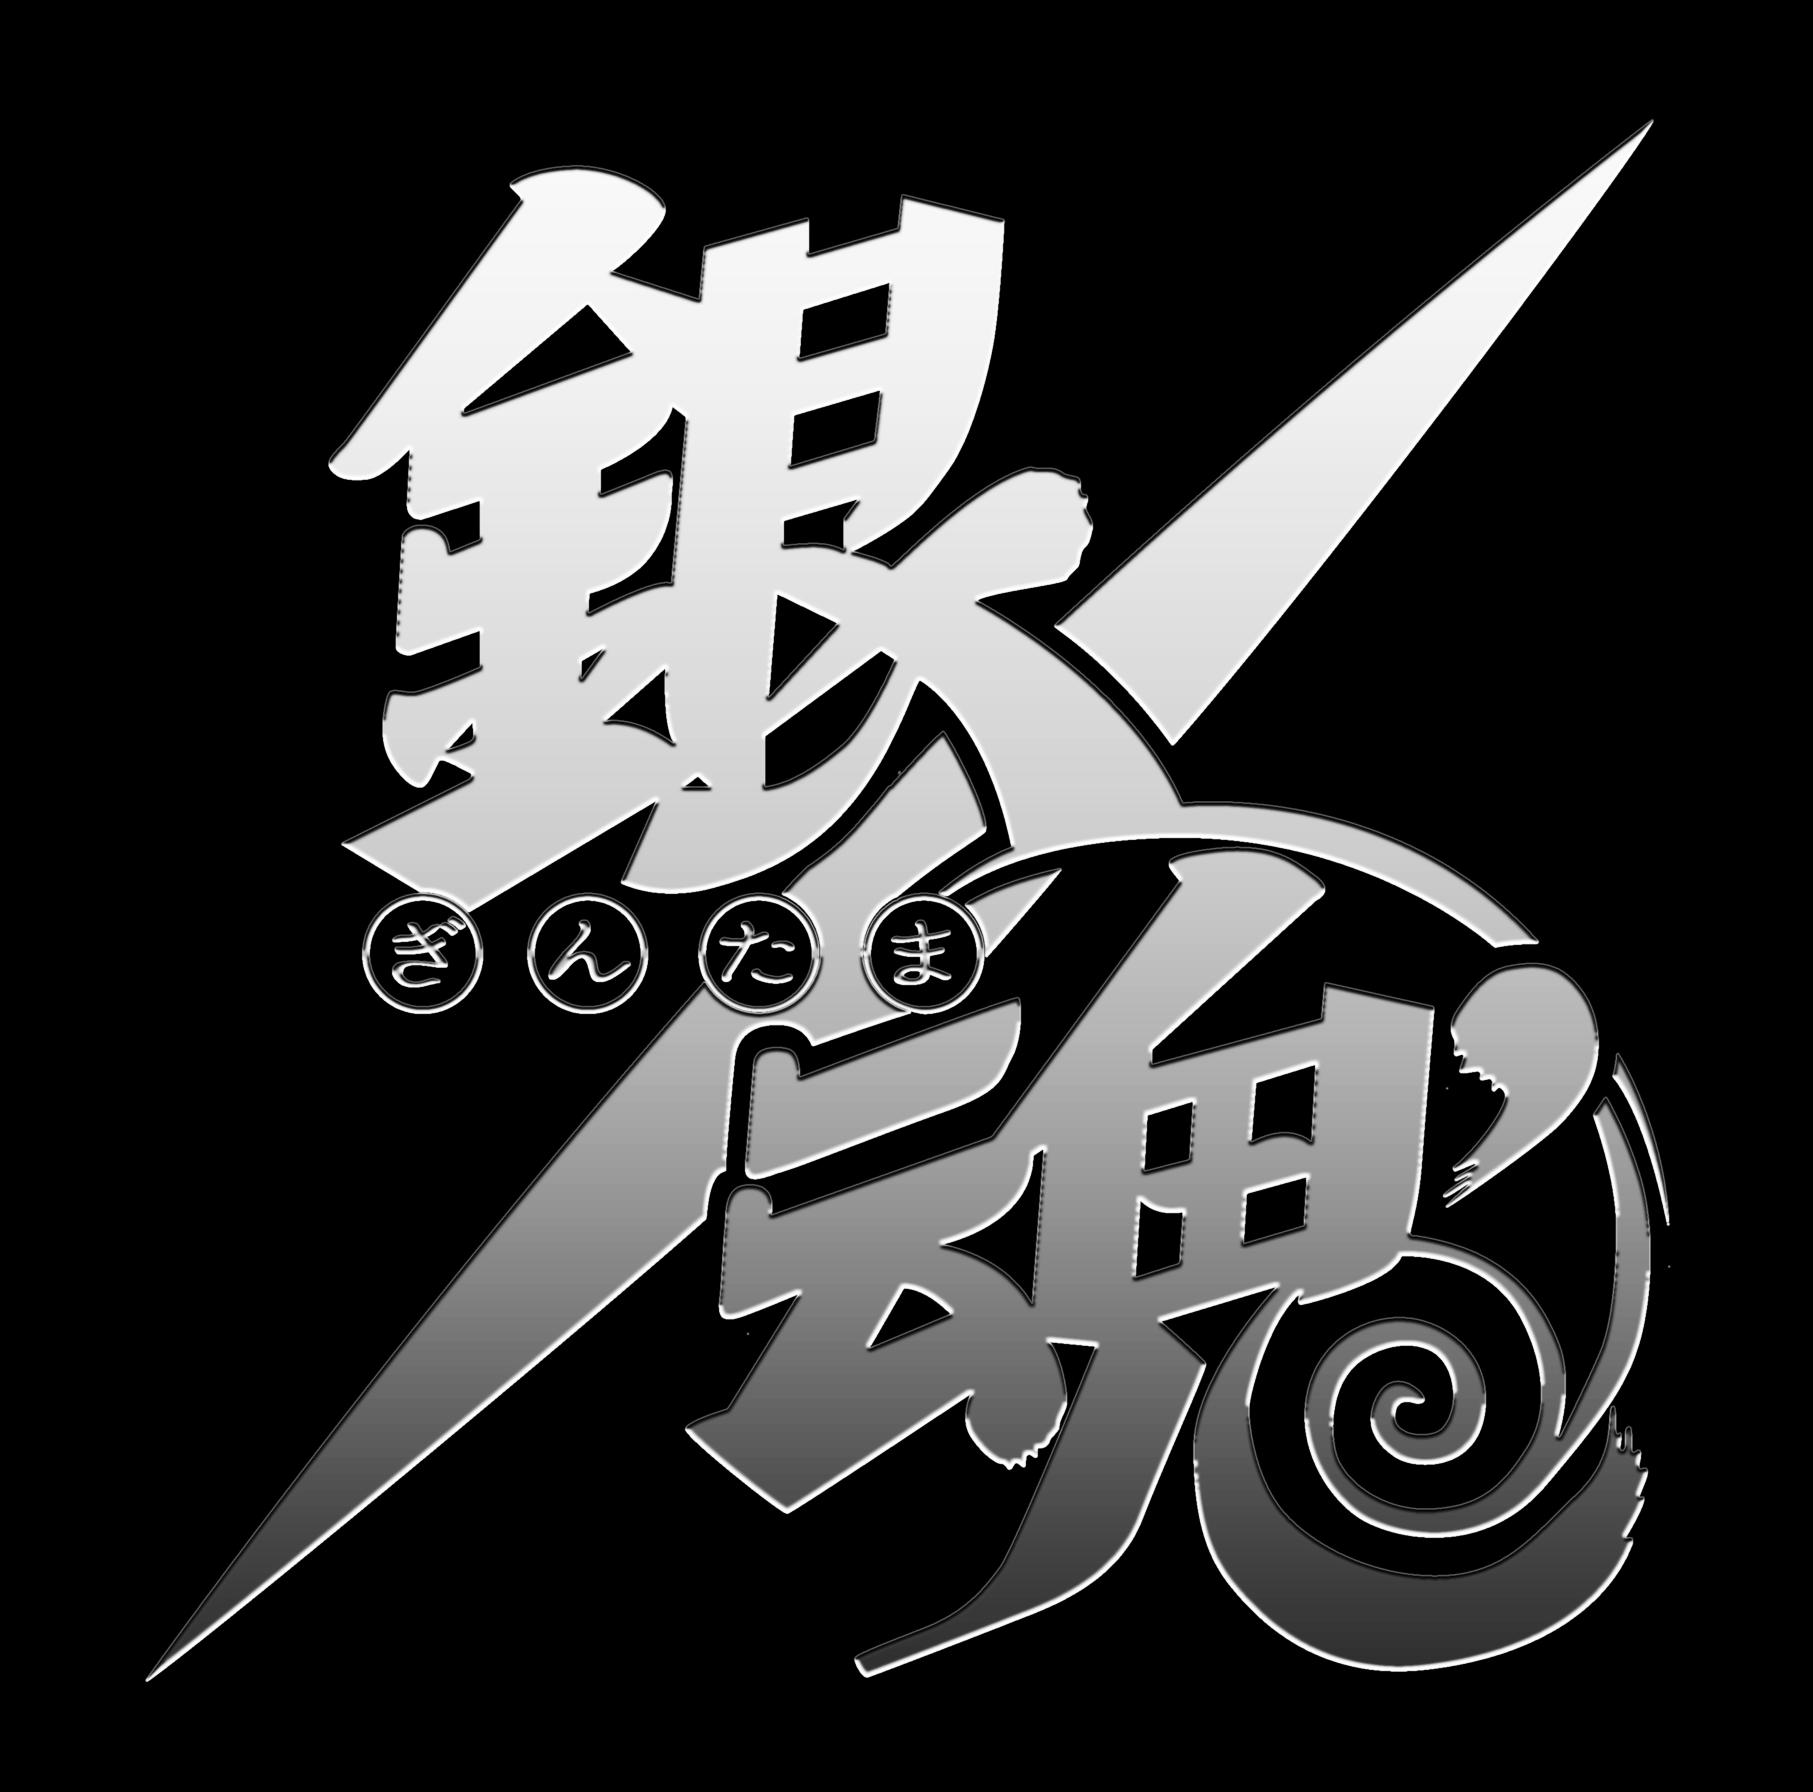 Gintama Tattoo Help